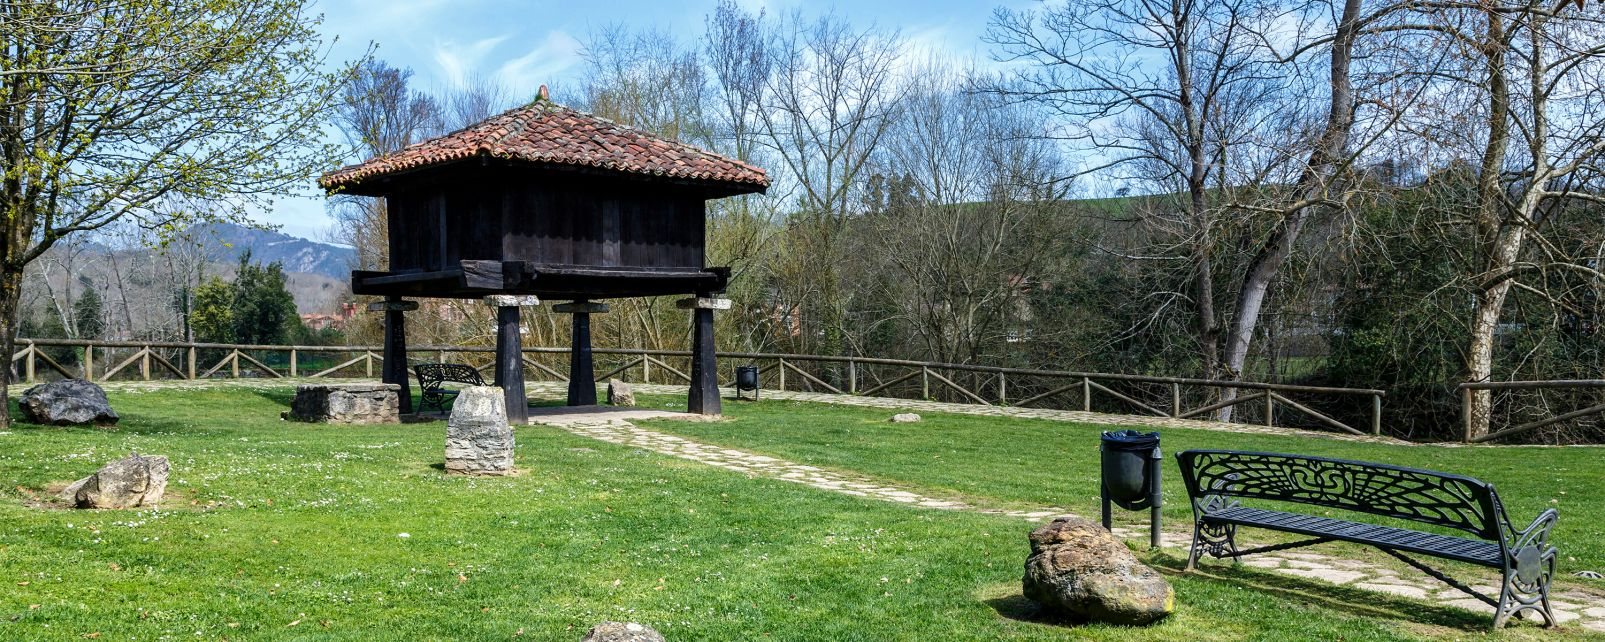 Les arts et la culture, horreo, grenier, asturies, agriculture, espagne, europe, tradition